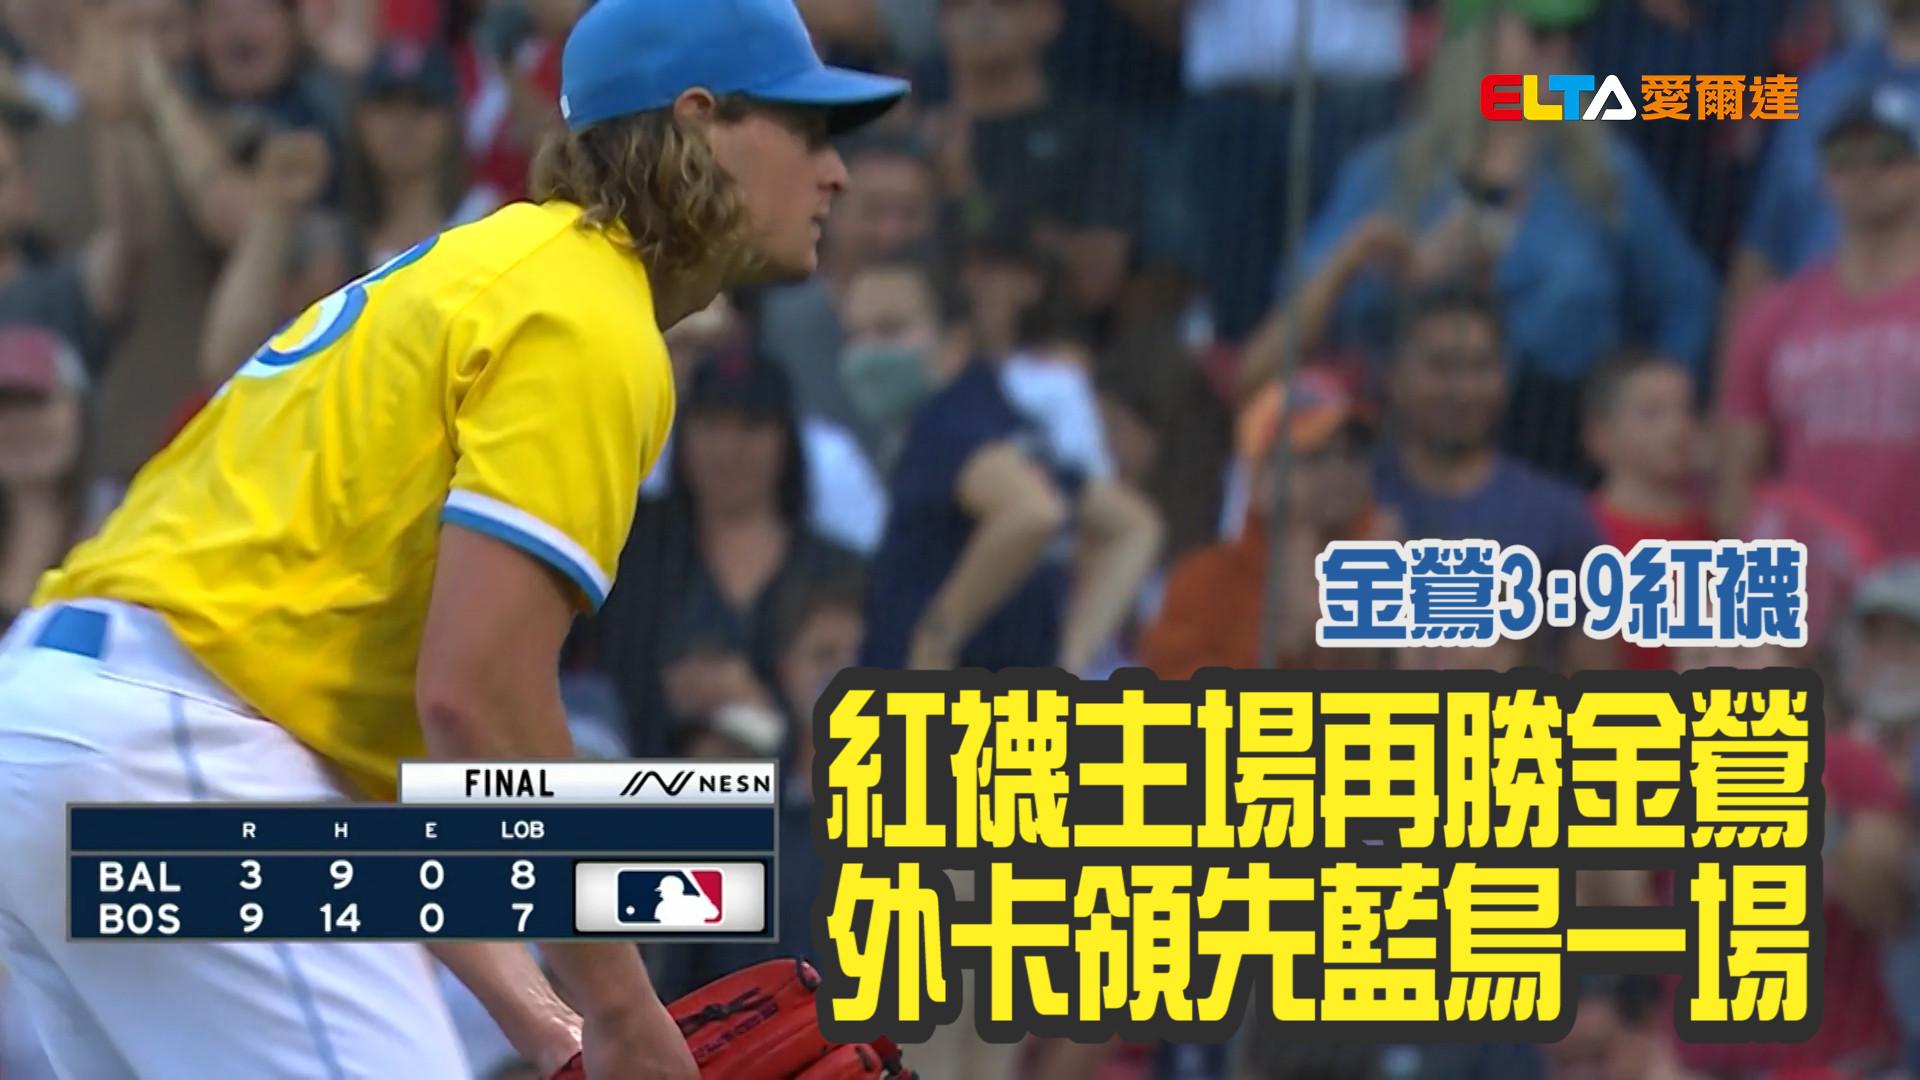 【MLB看愛爾達】紅襪主場再勝金鶯 外卡領先藍鳥一場 9/19